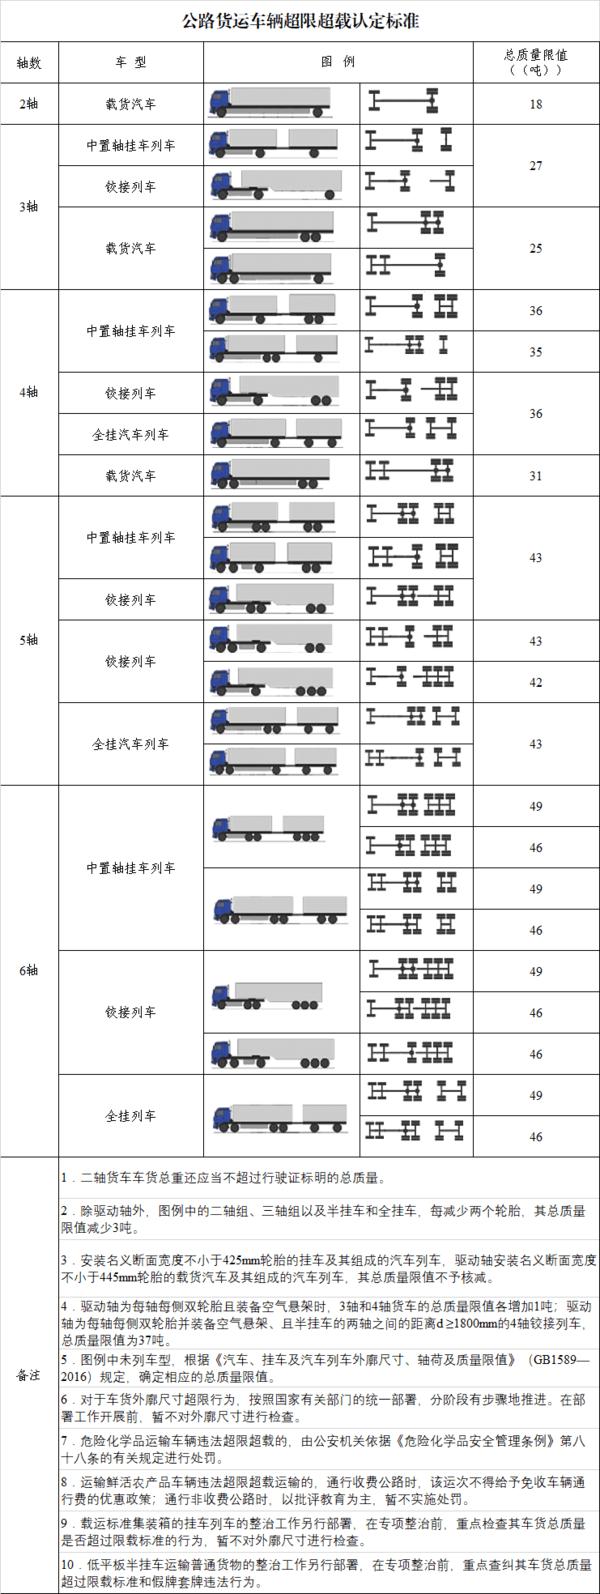 6x2牵引车上高速总重最多只能46吨湖北高速货车超载标准调整